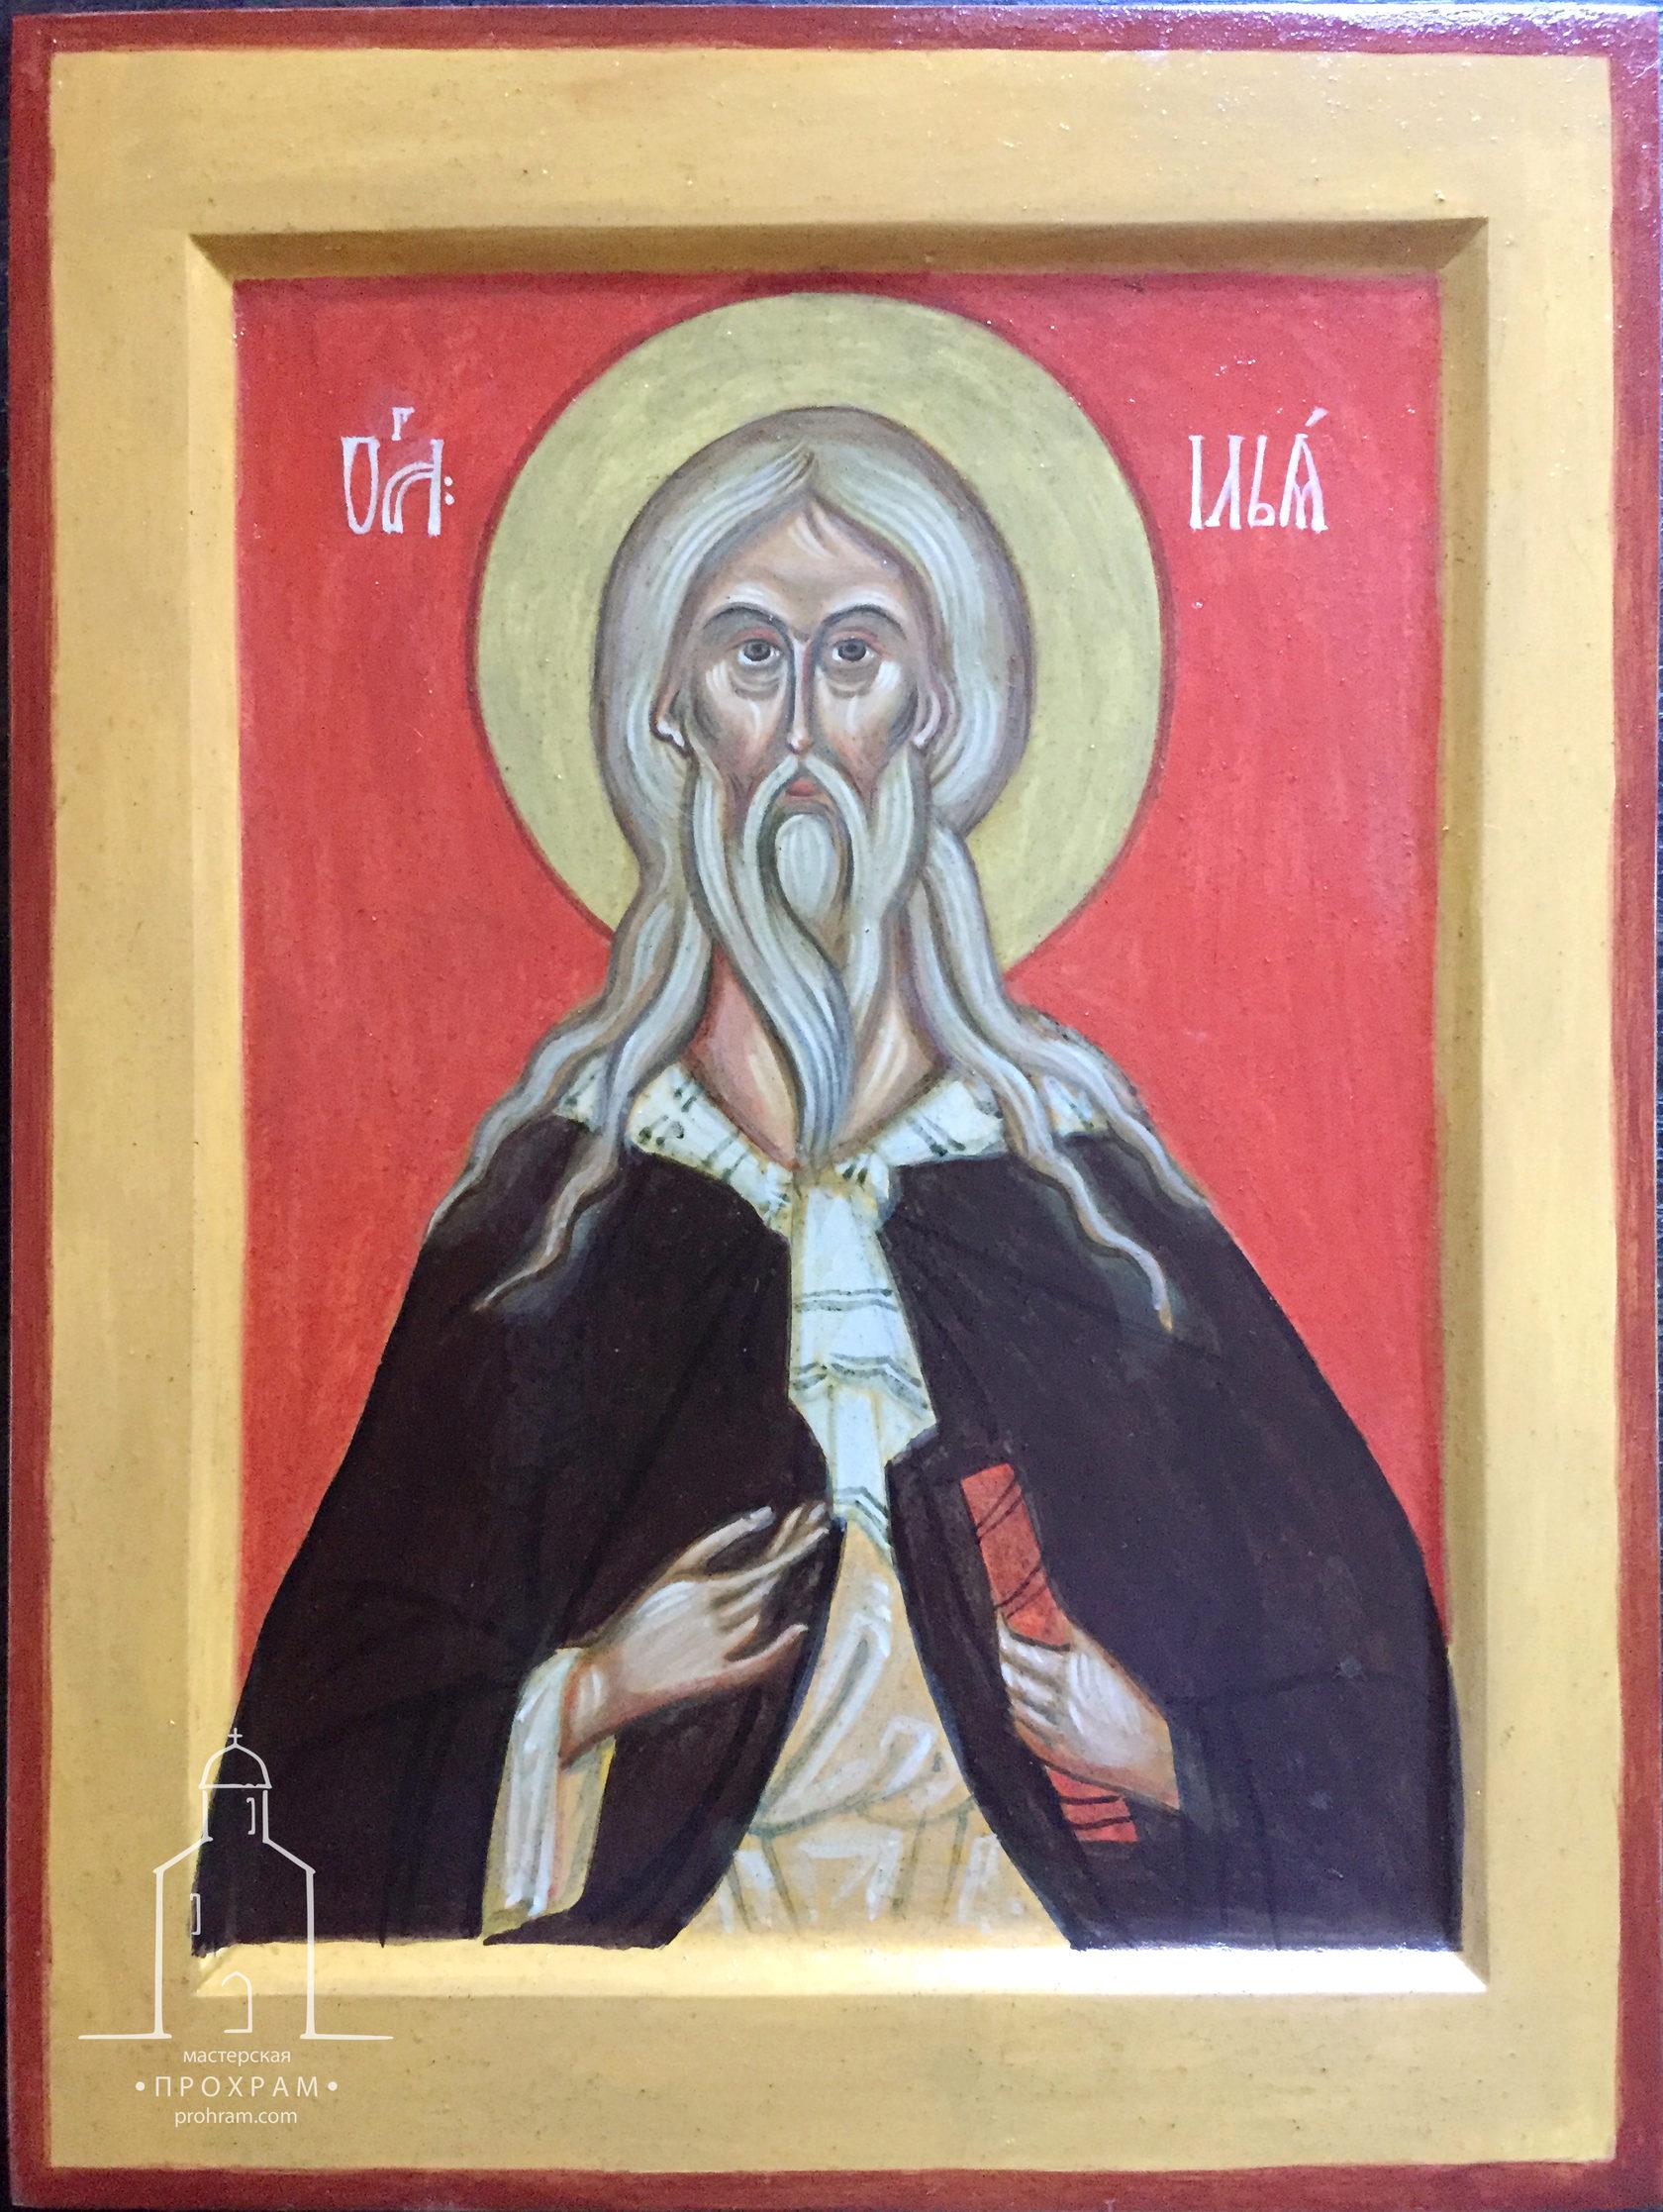 icon paintihg, hand painted icon of St. Elijah the Prophet, egg tempera